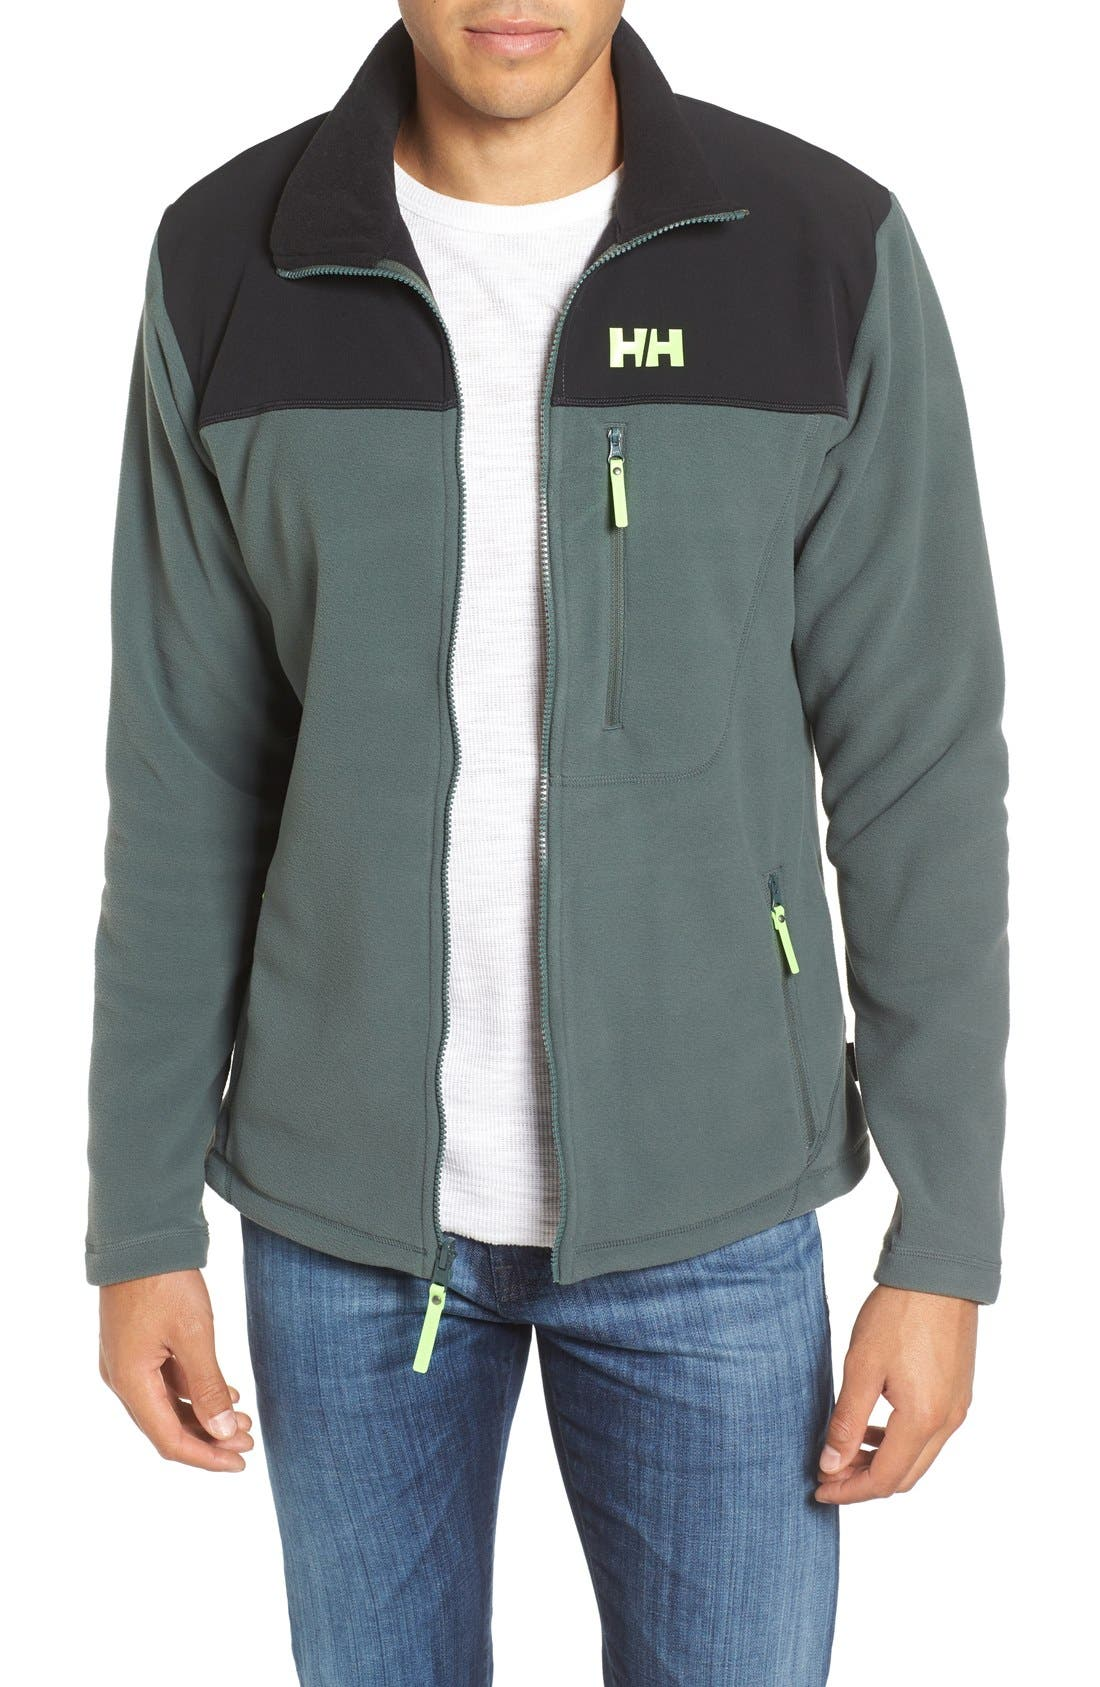 Main Image - Helly Hansen Sitka Fleece Jacket